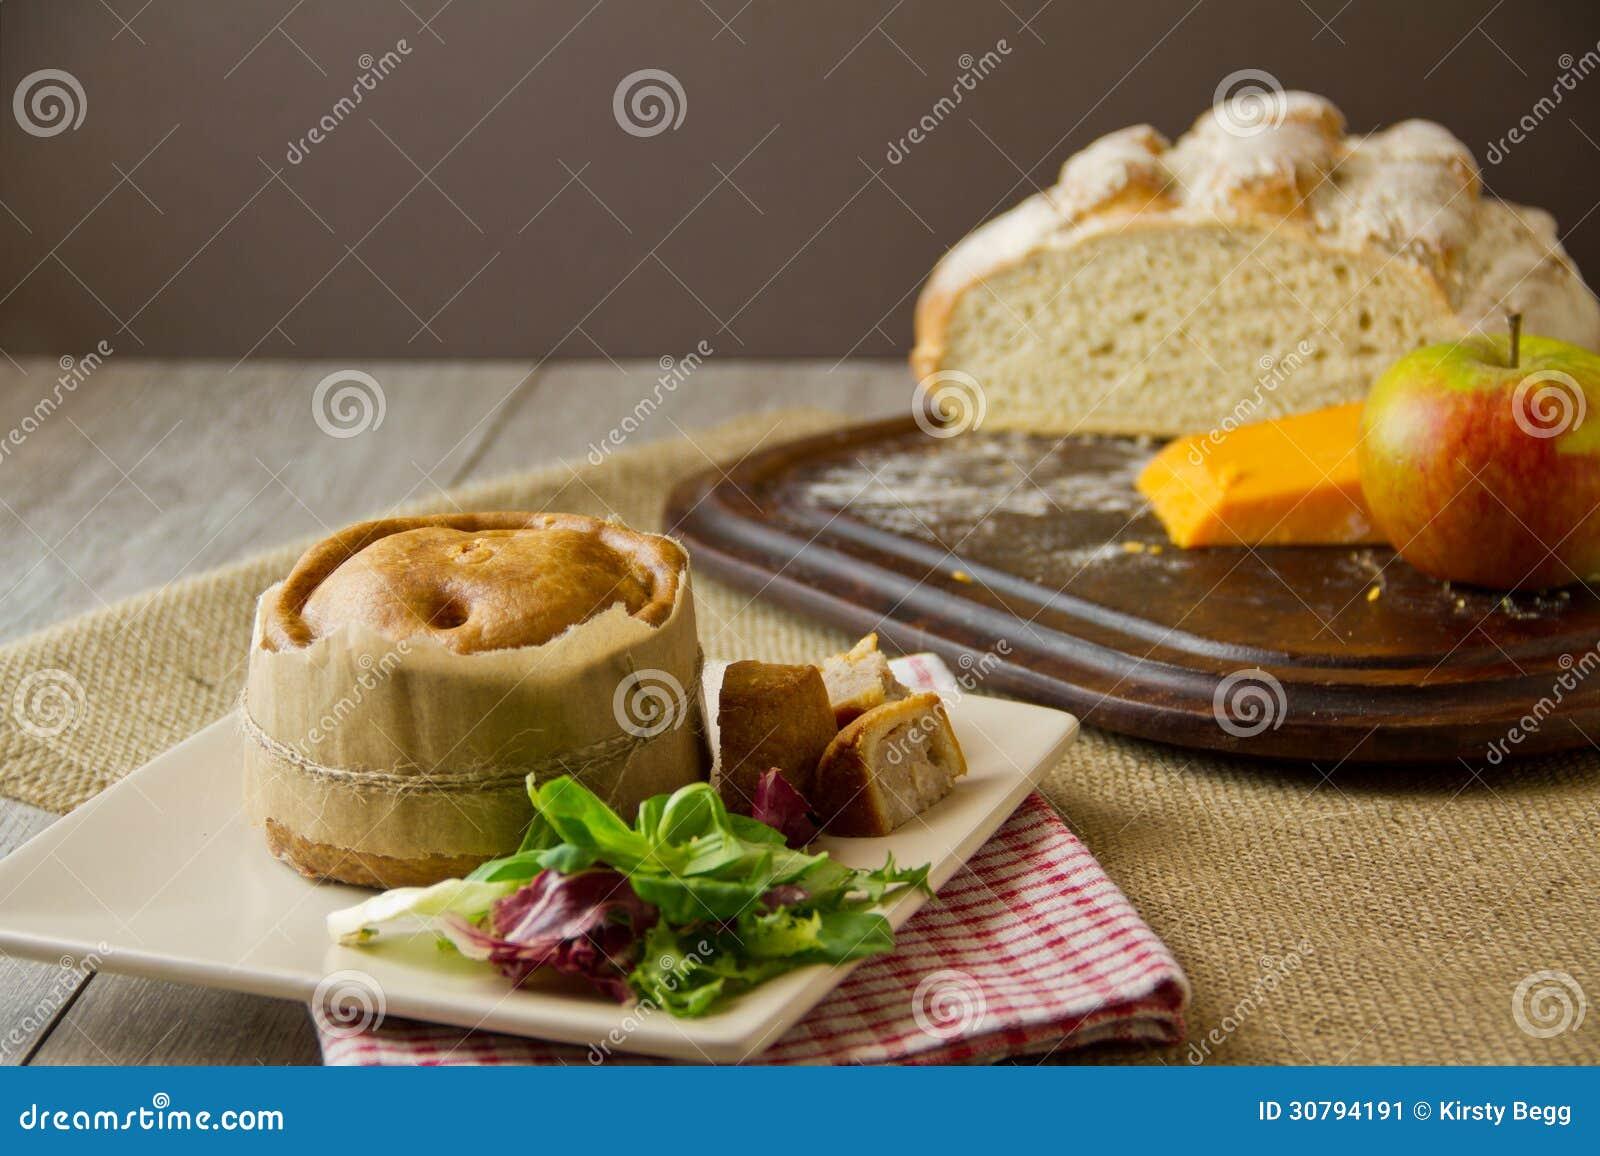 Country Farmhouse Plans Melton Mowbray Pork Pie Ploughman S Lunch Stock Image